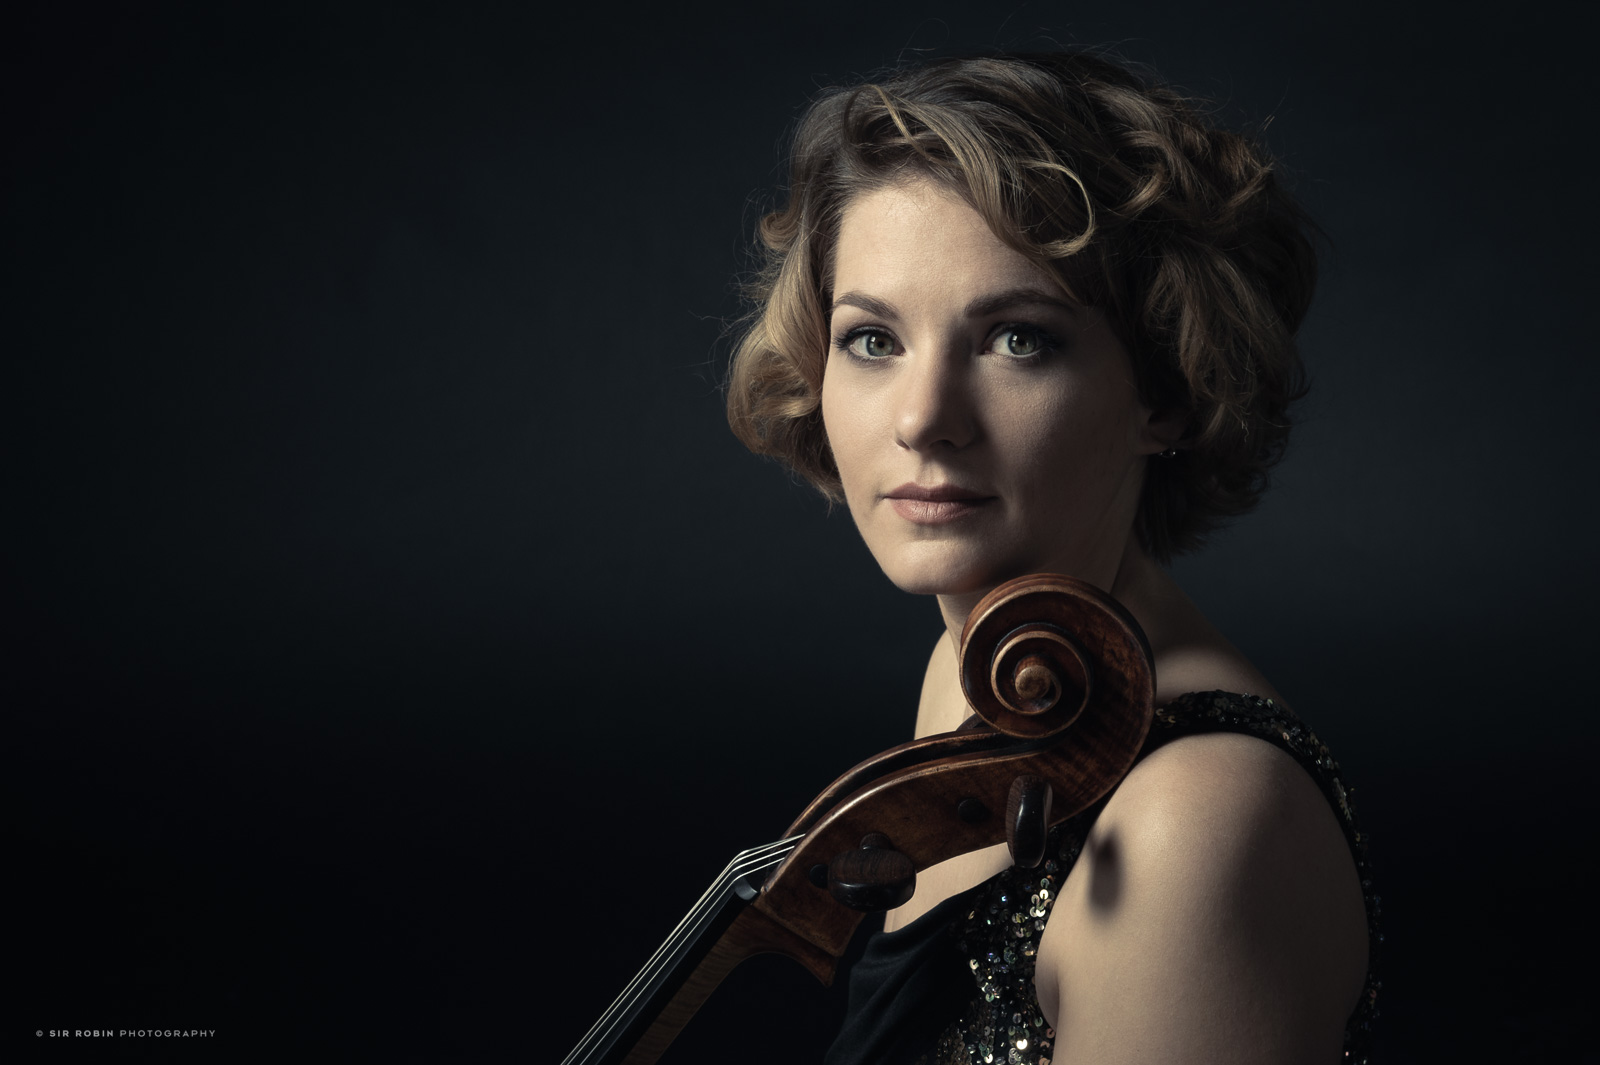 Cécile Grüebler